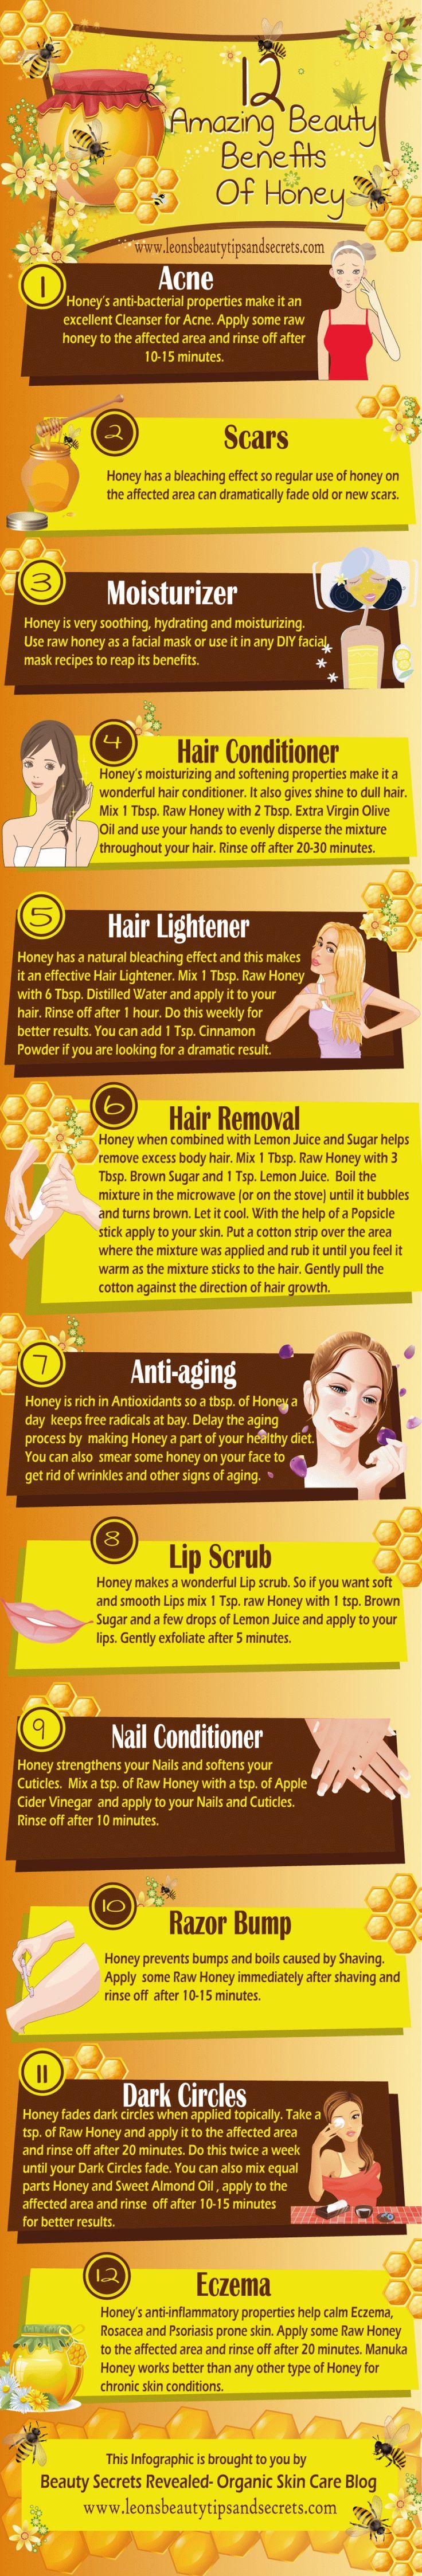 Amazing Beauty Benefits of Honey.